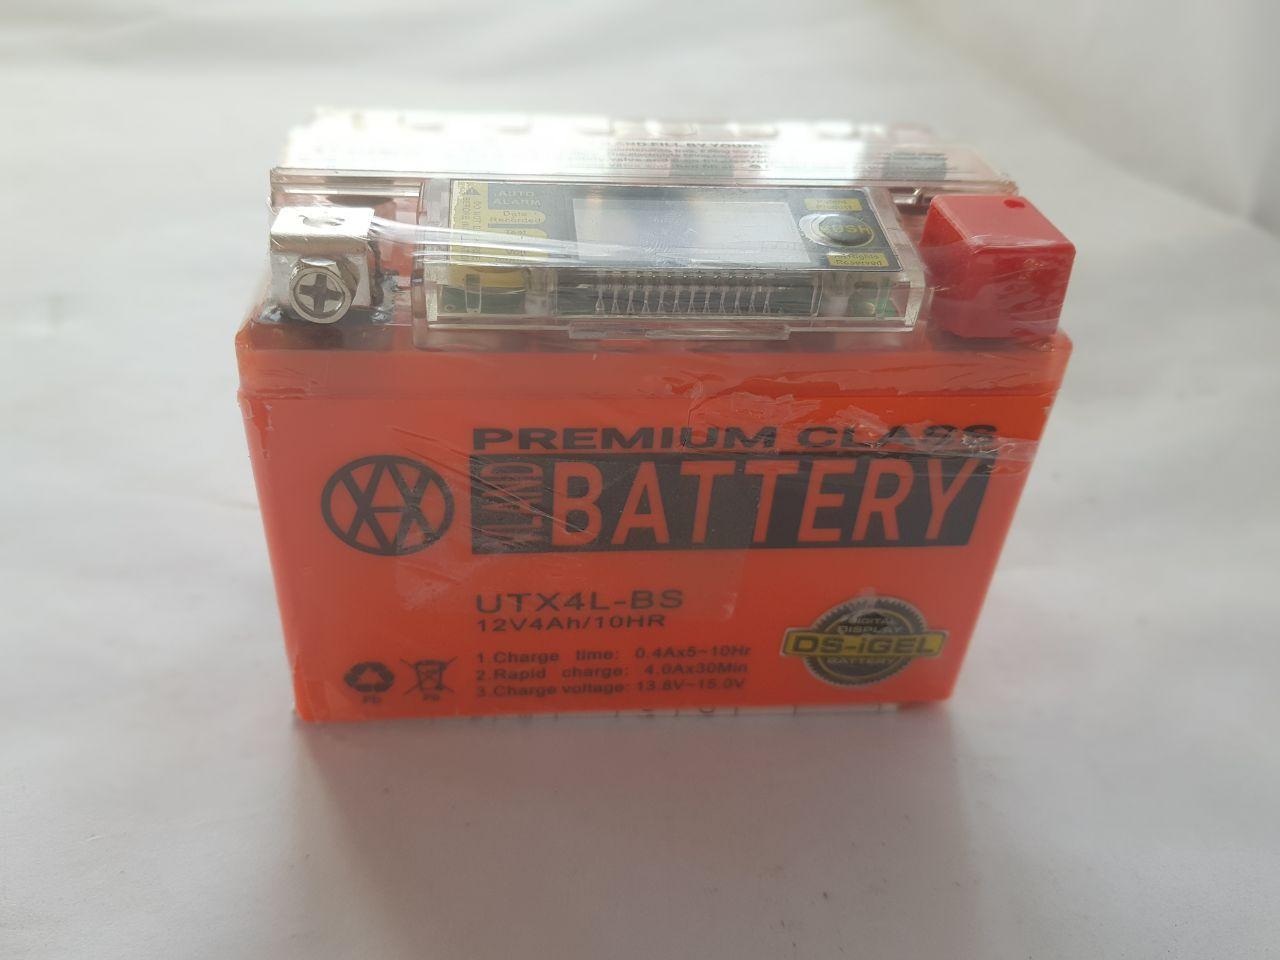 Аккумулятор 4A 12V Honda/Yamaha (YTX4L-BS) VLAND гелевий с цифровым вольтметром 113x70x87